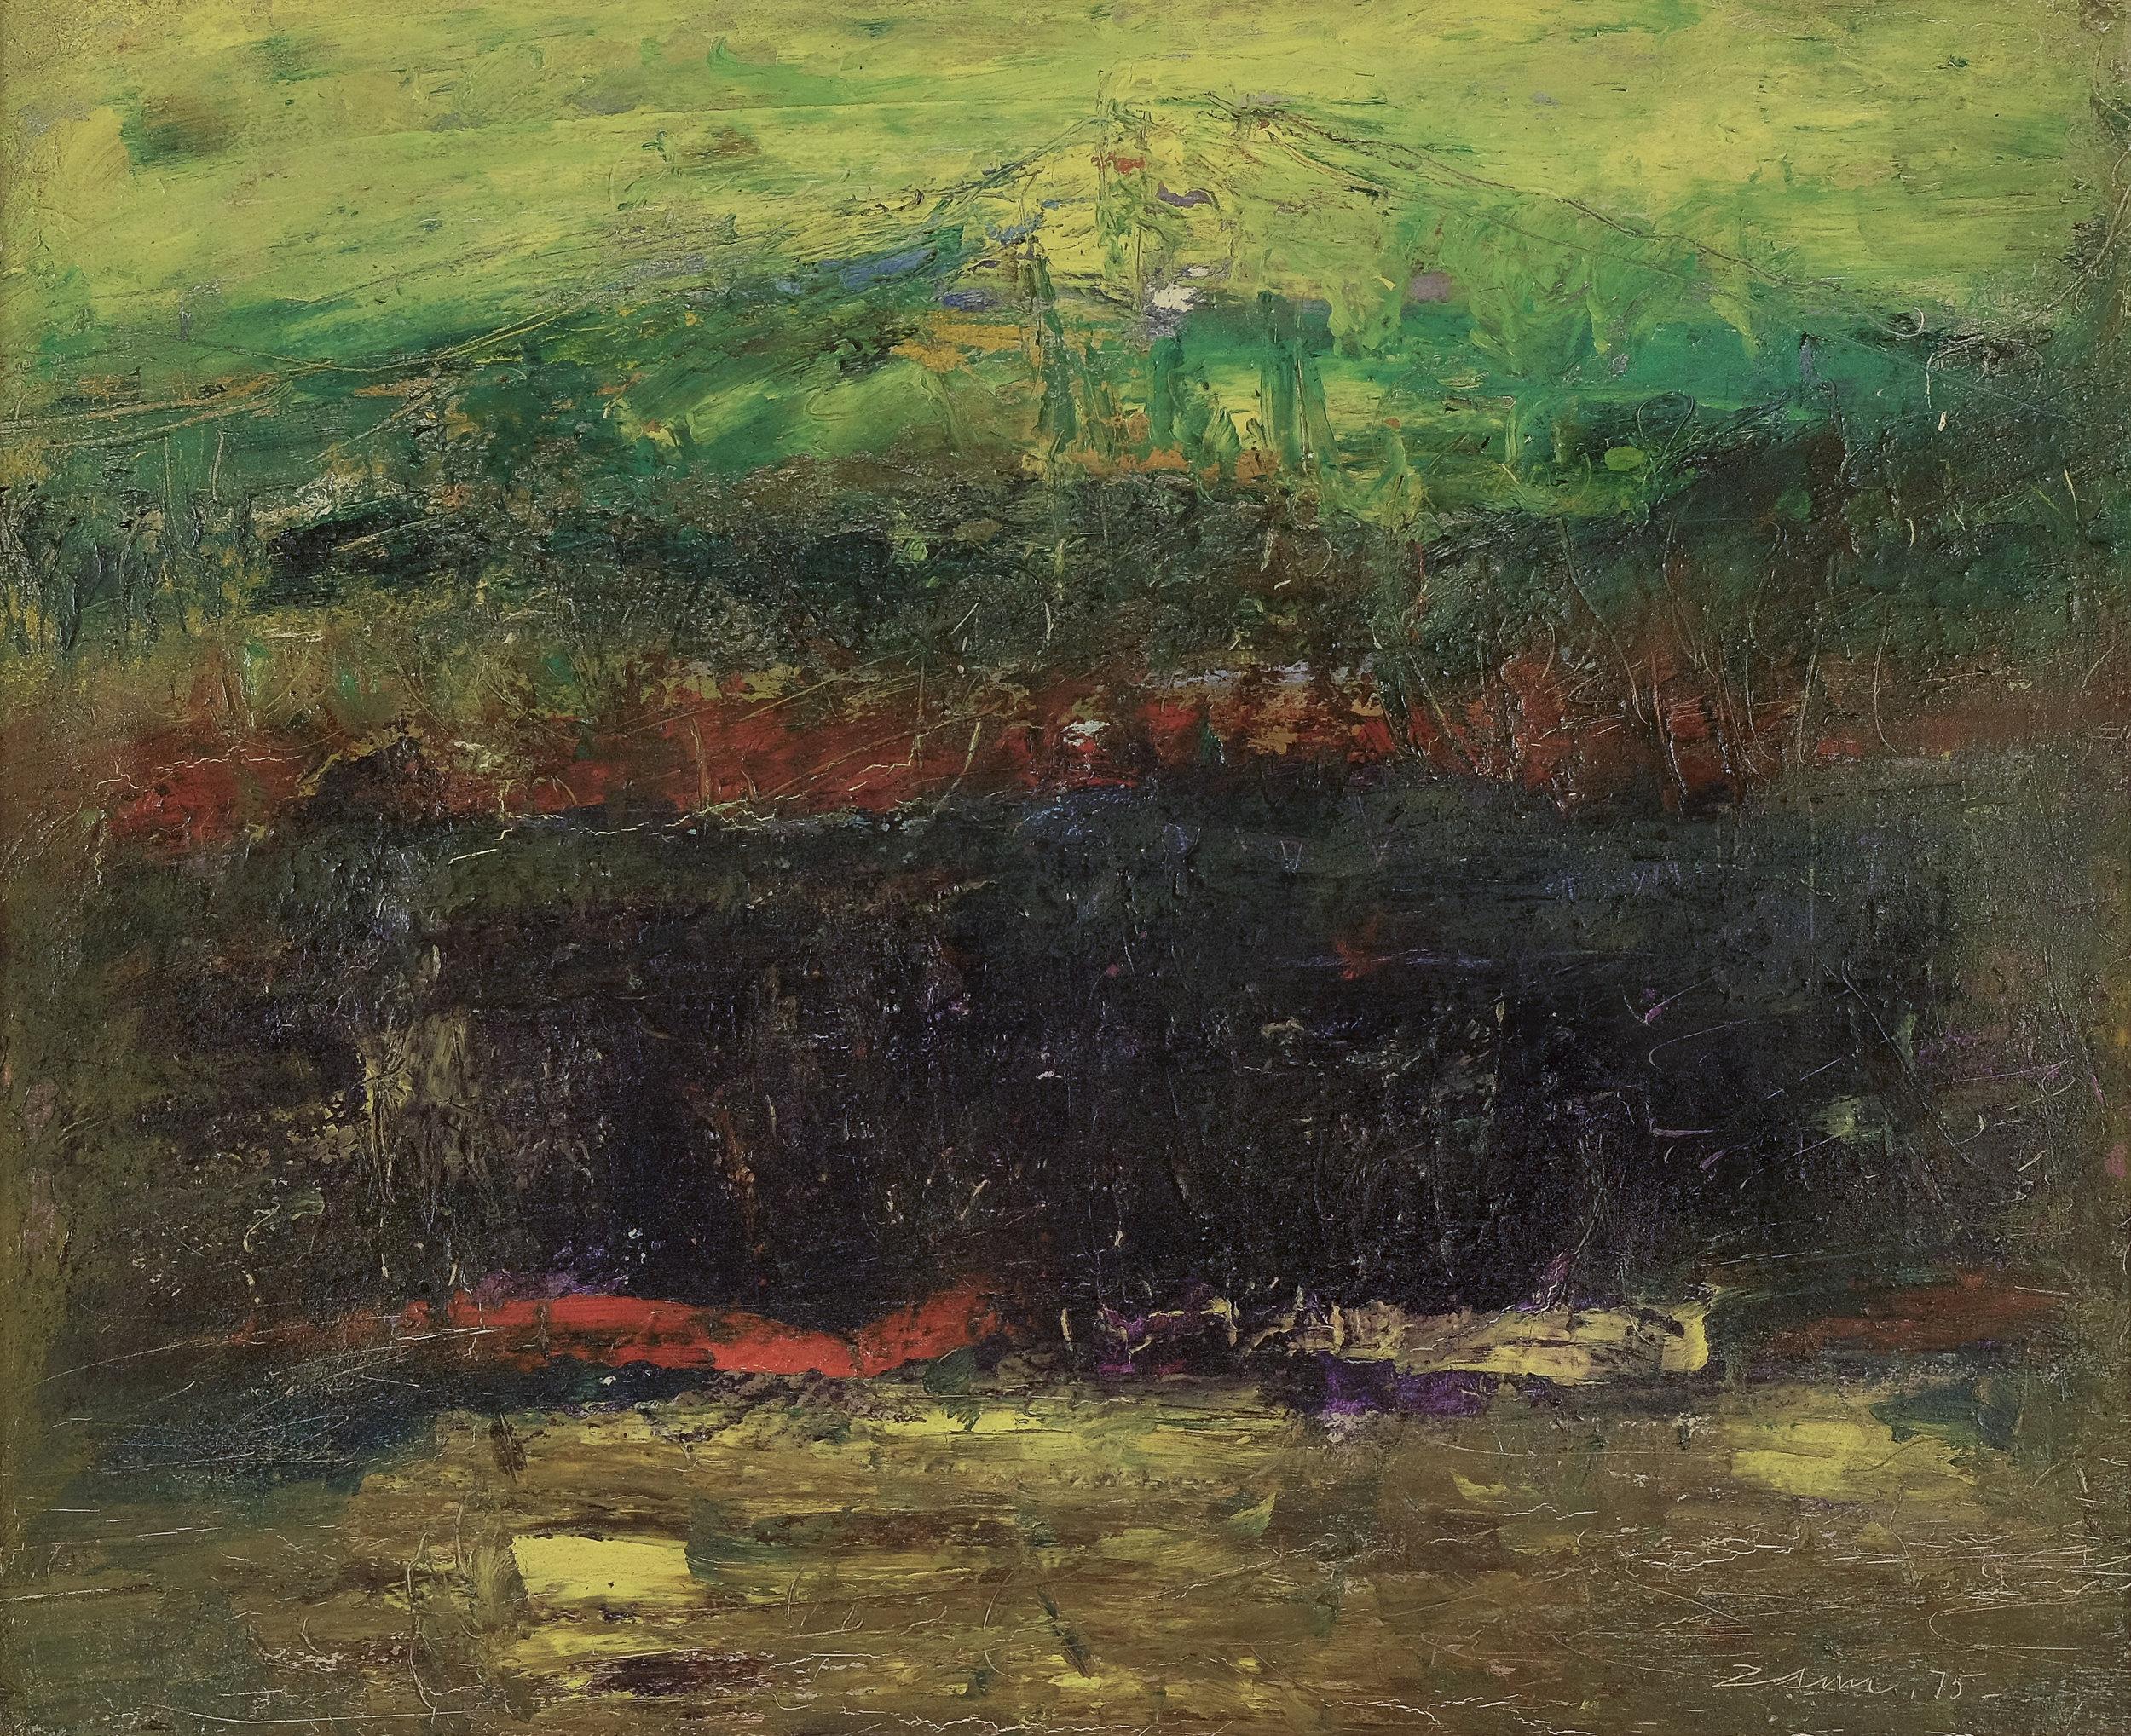 Zaini, Gunung dan Laut (The Mountain and the Sea), oil on canvas, 30 x 40 cm, 1975